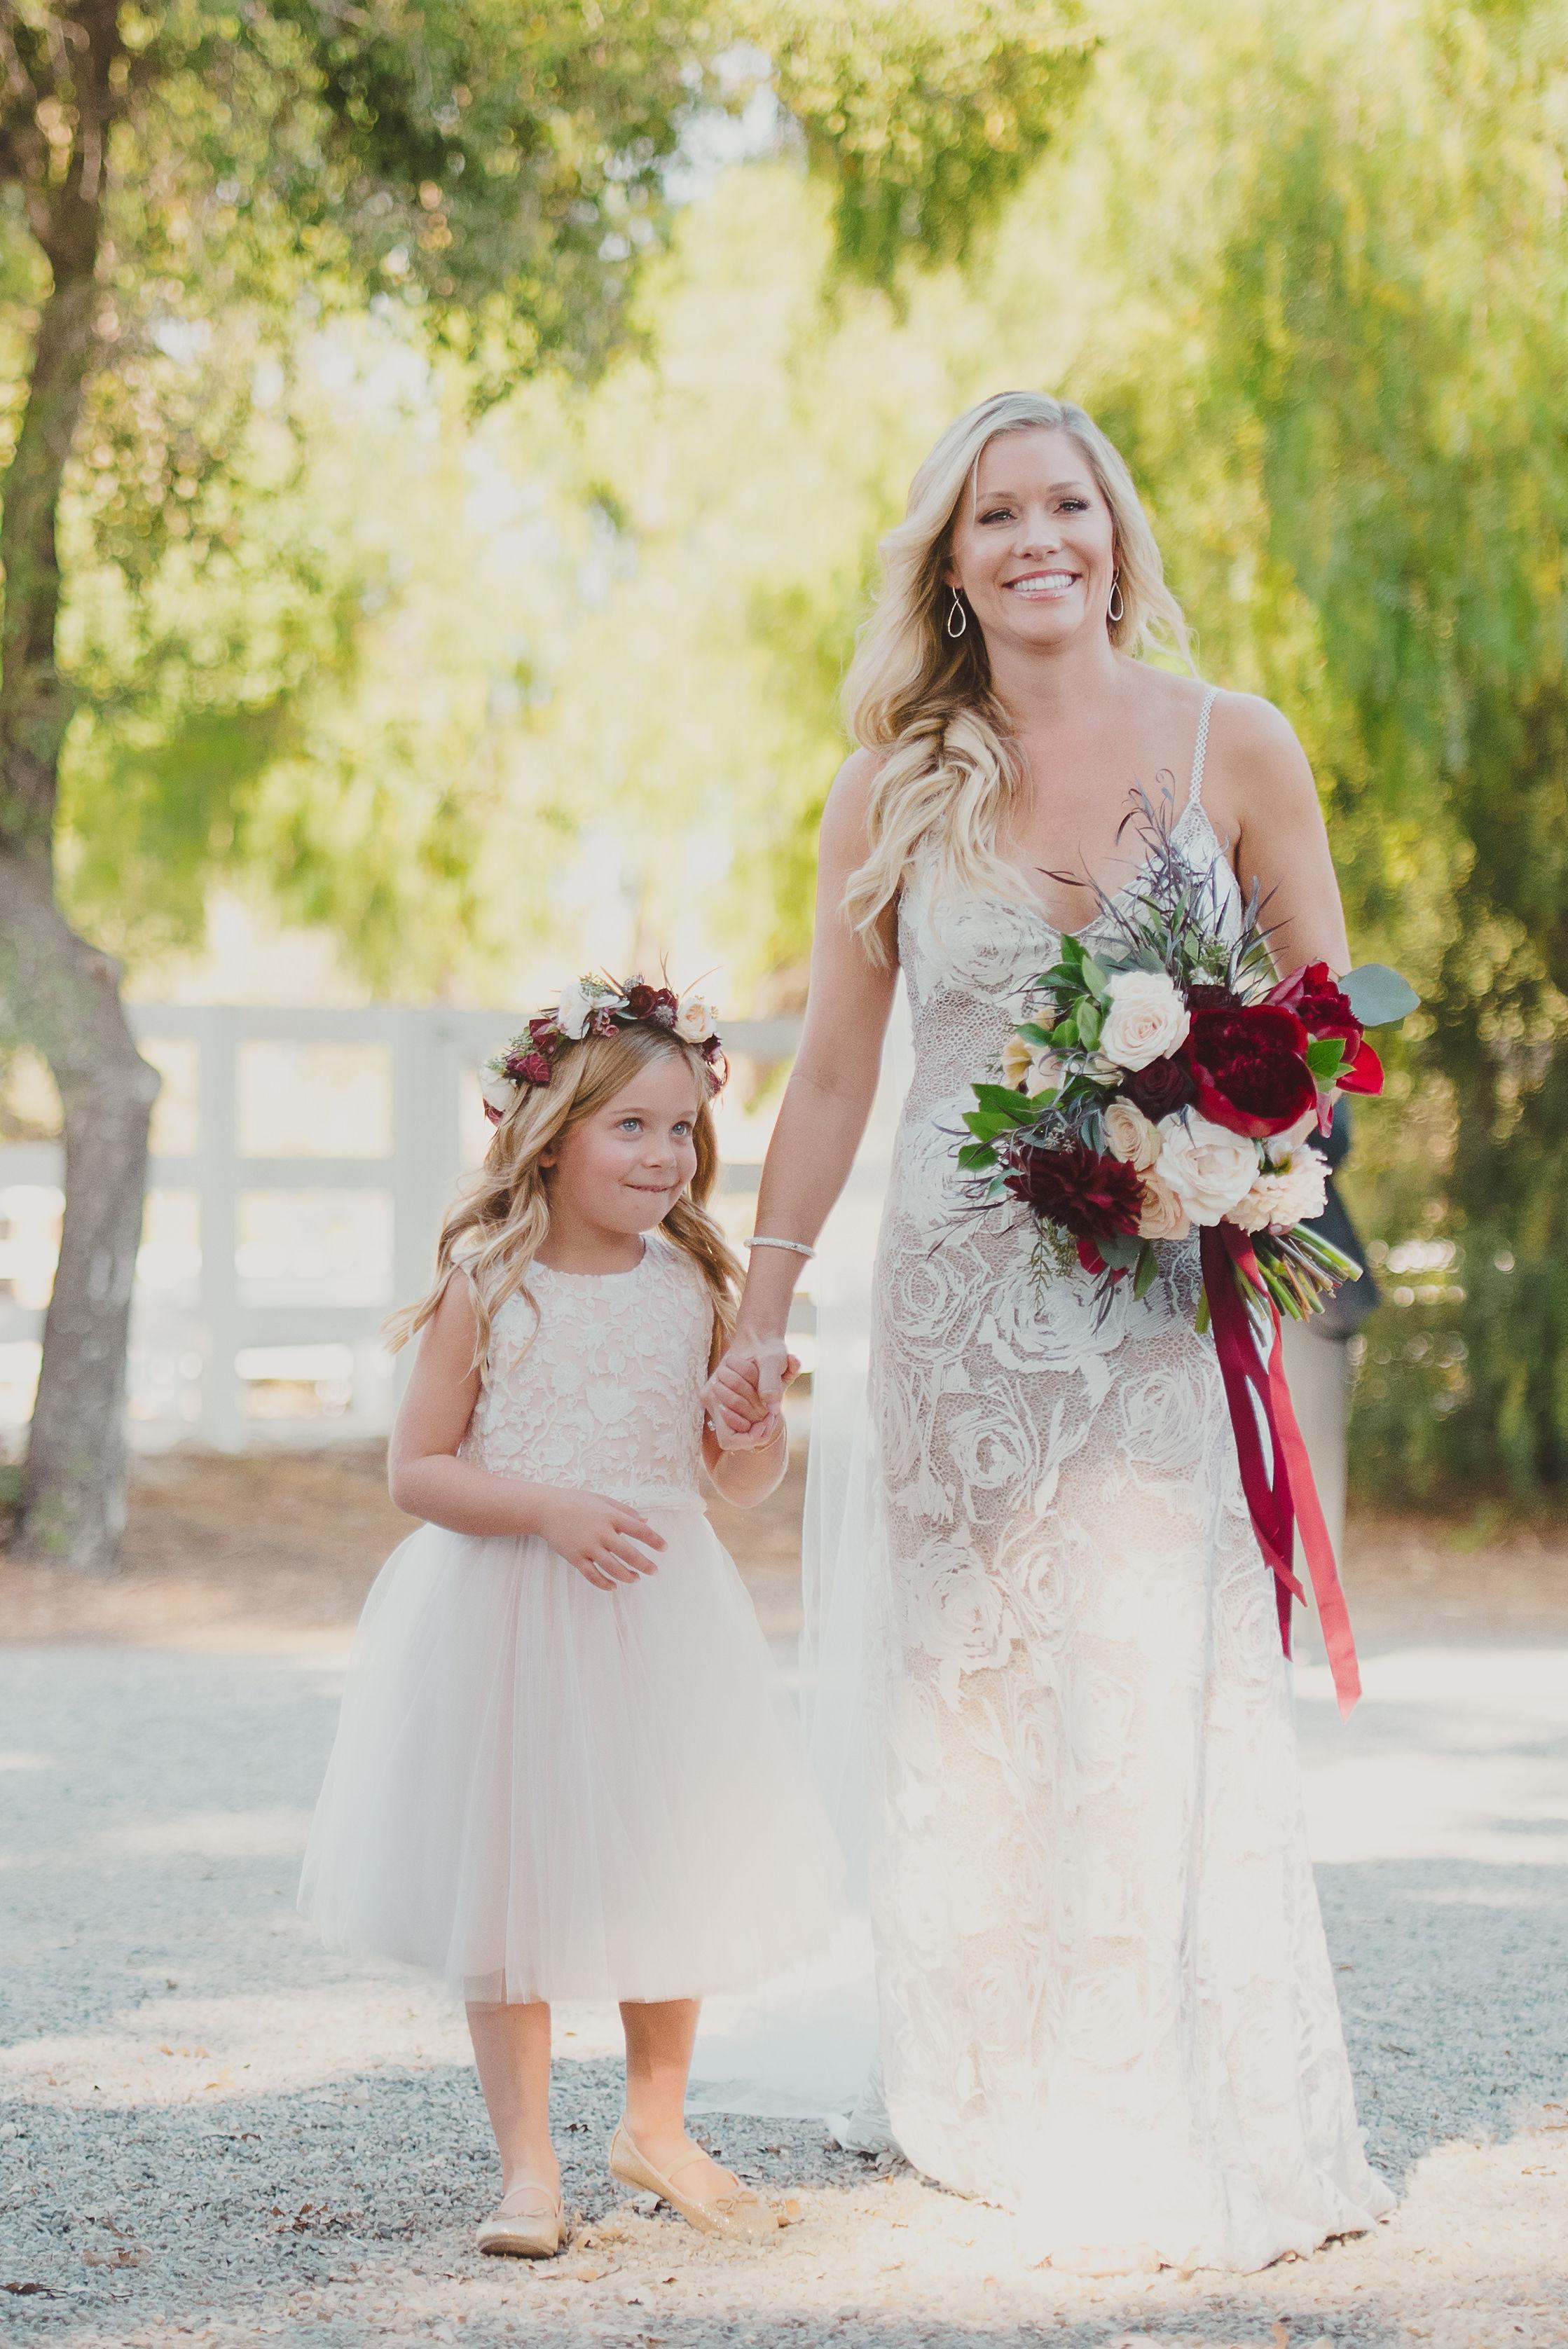 181026-Marisa-JB-Wedding-3869.jpg